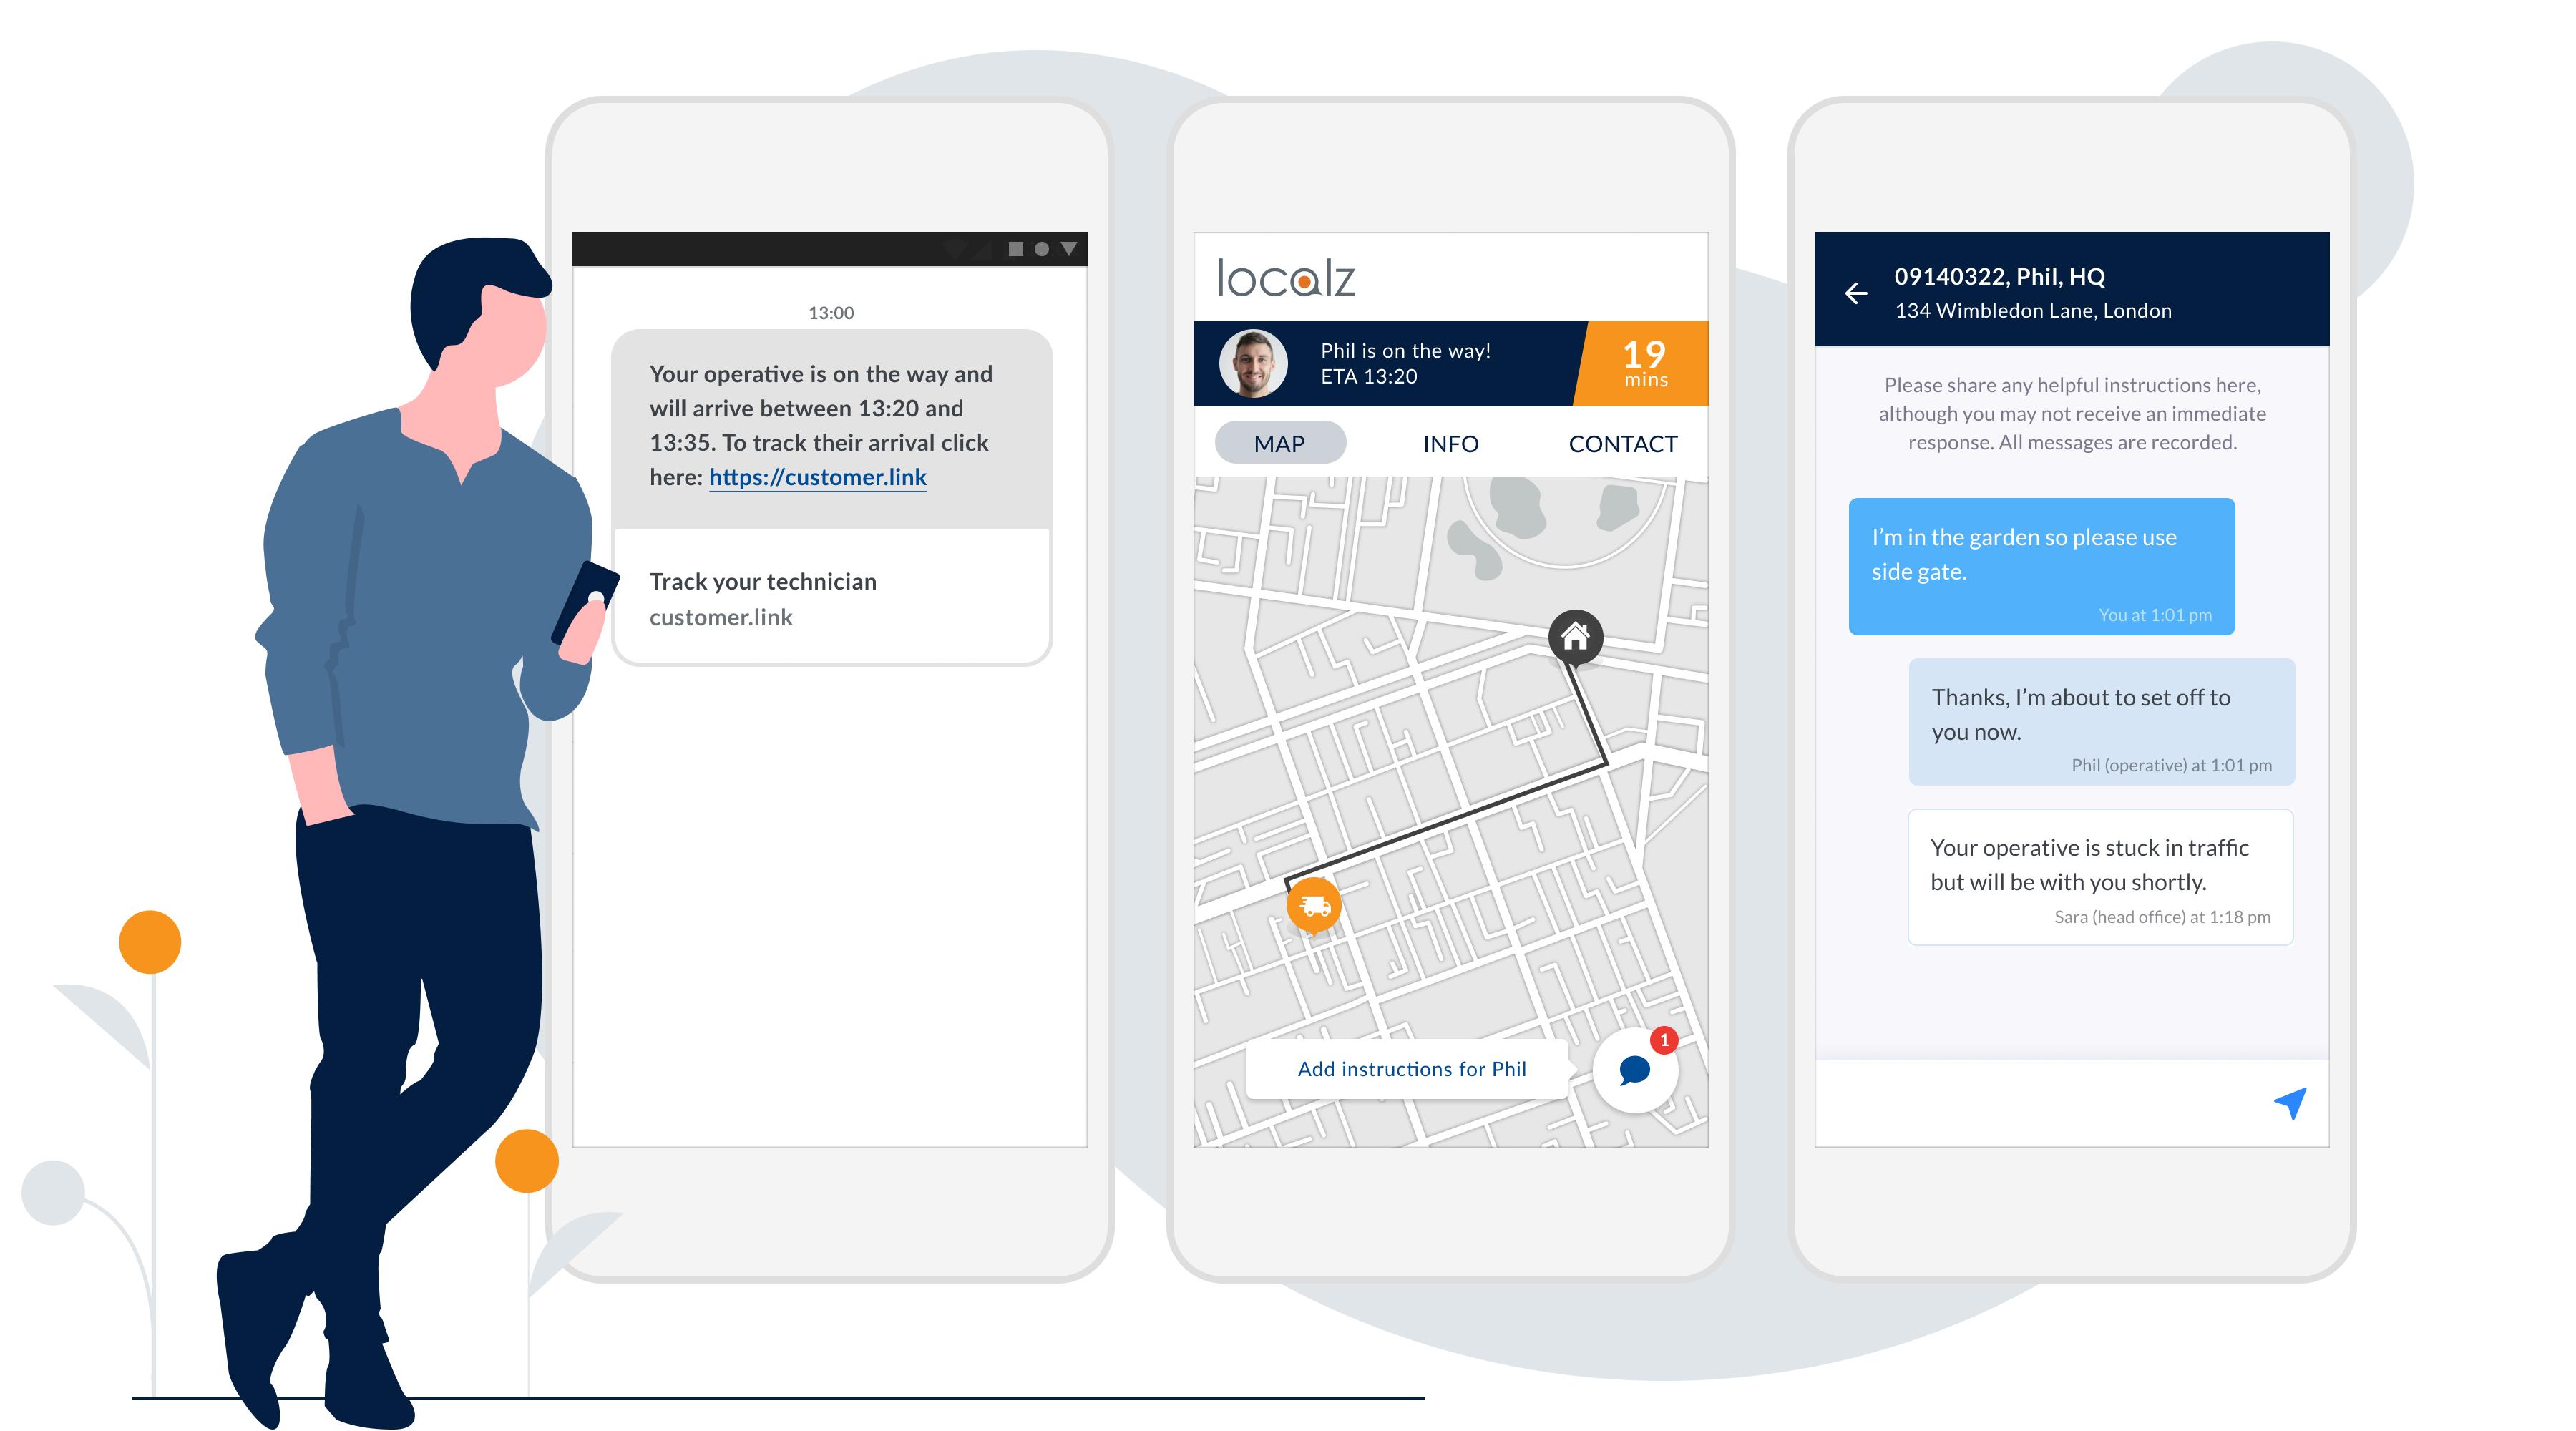 bg-chat-customer-experience